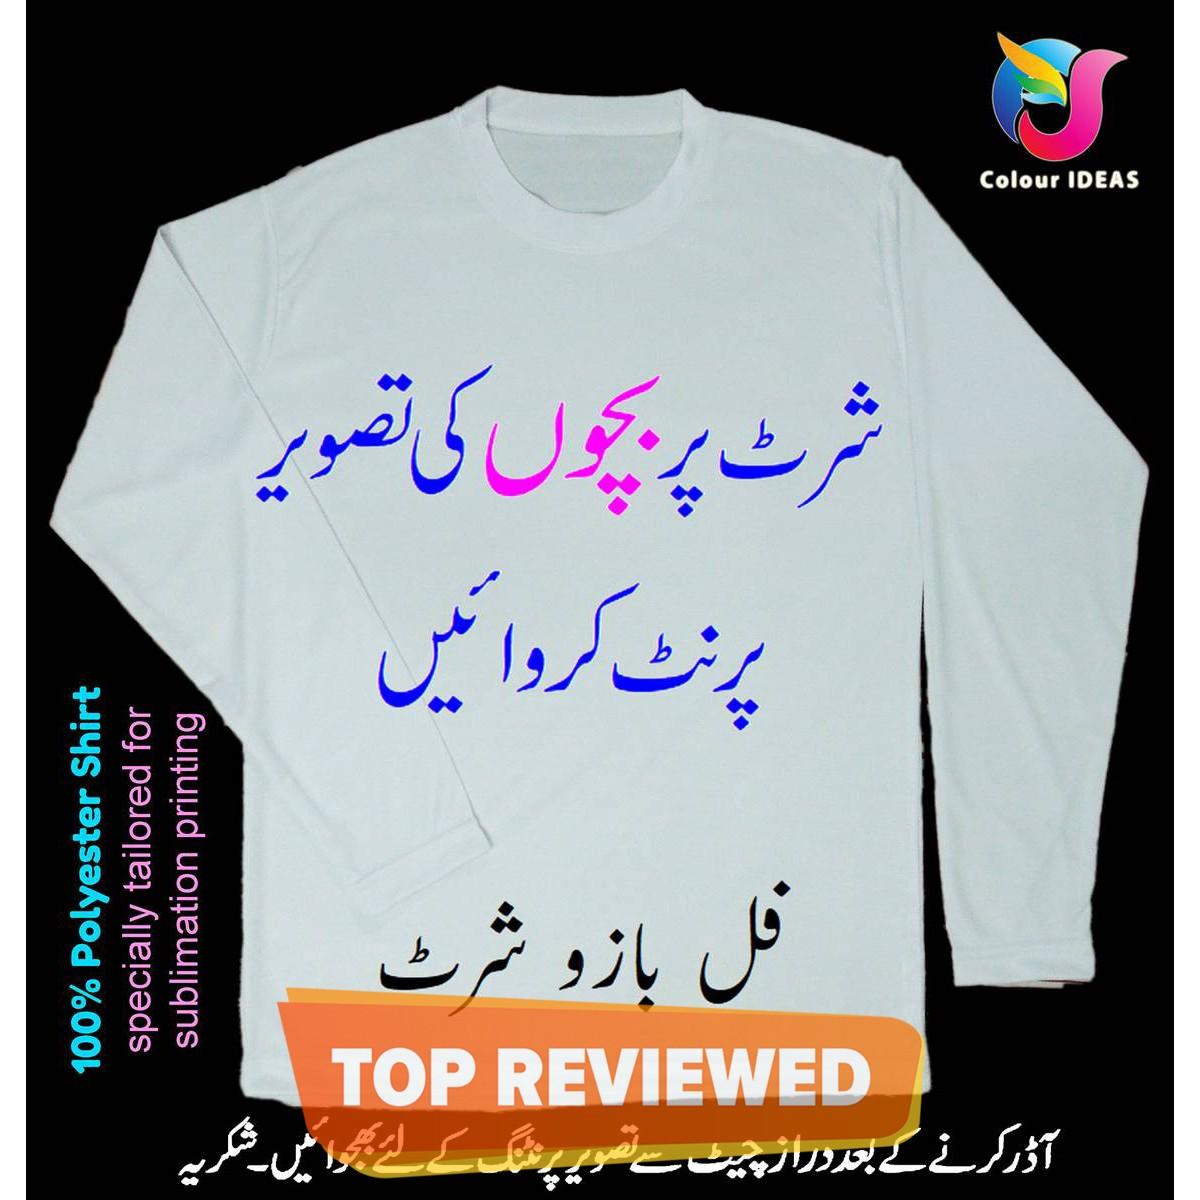 Picture Gift Shirt for Kids - Full Sleeve